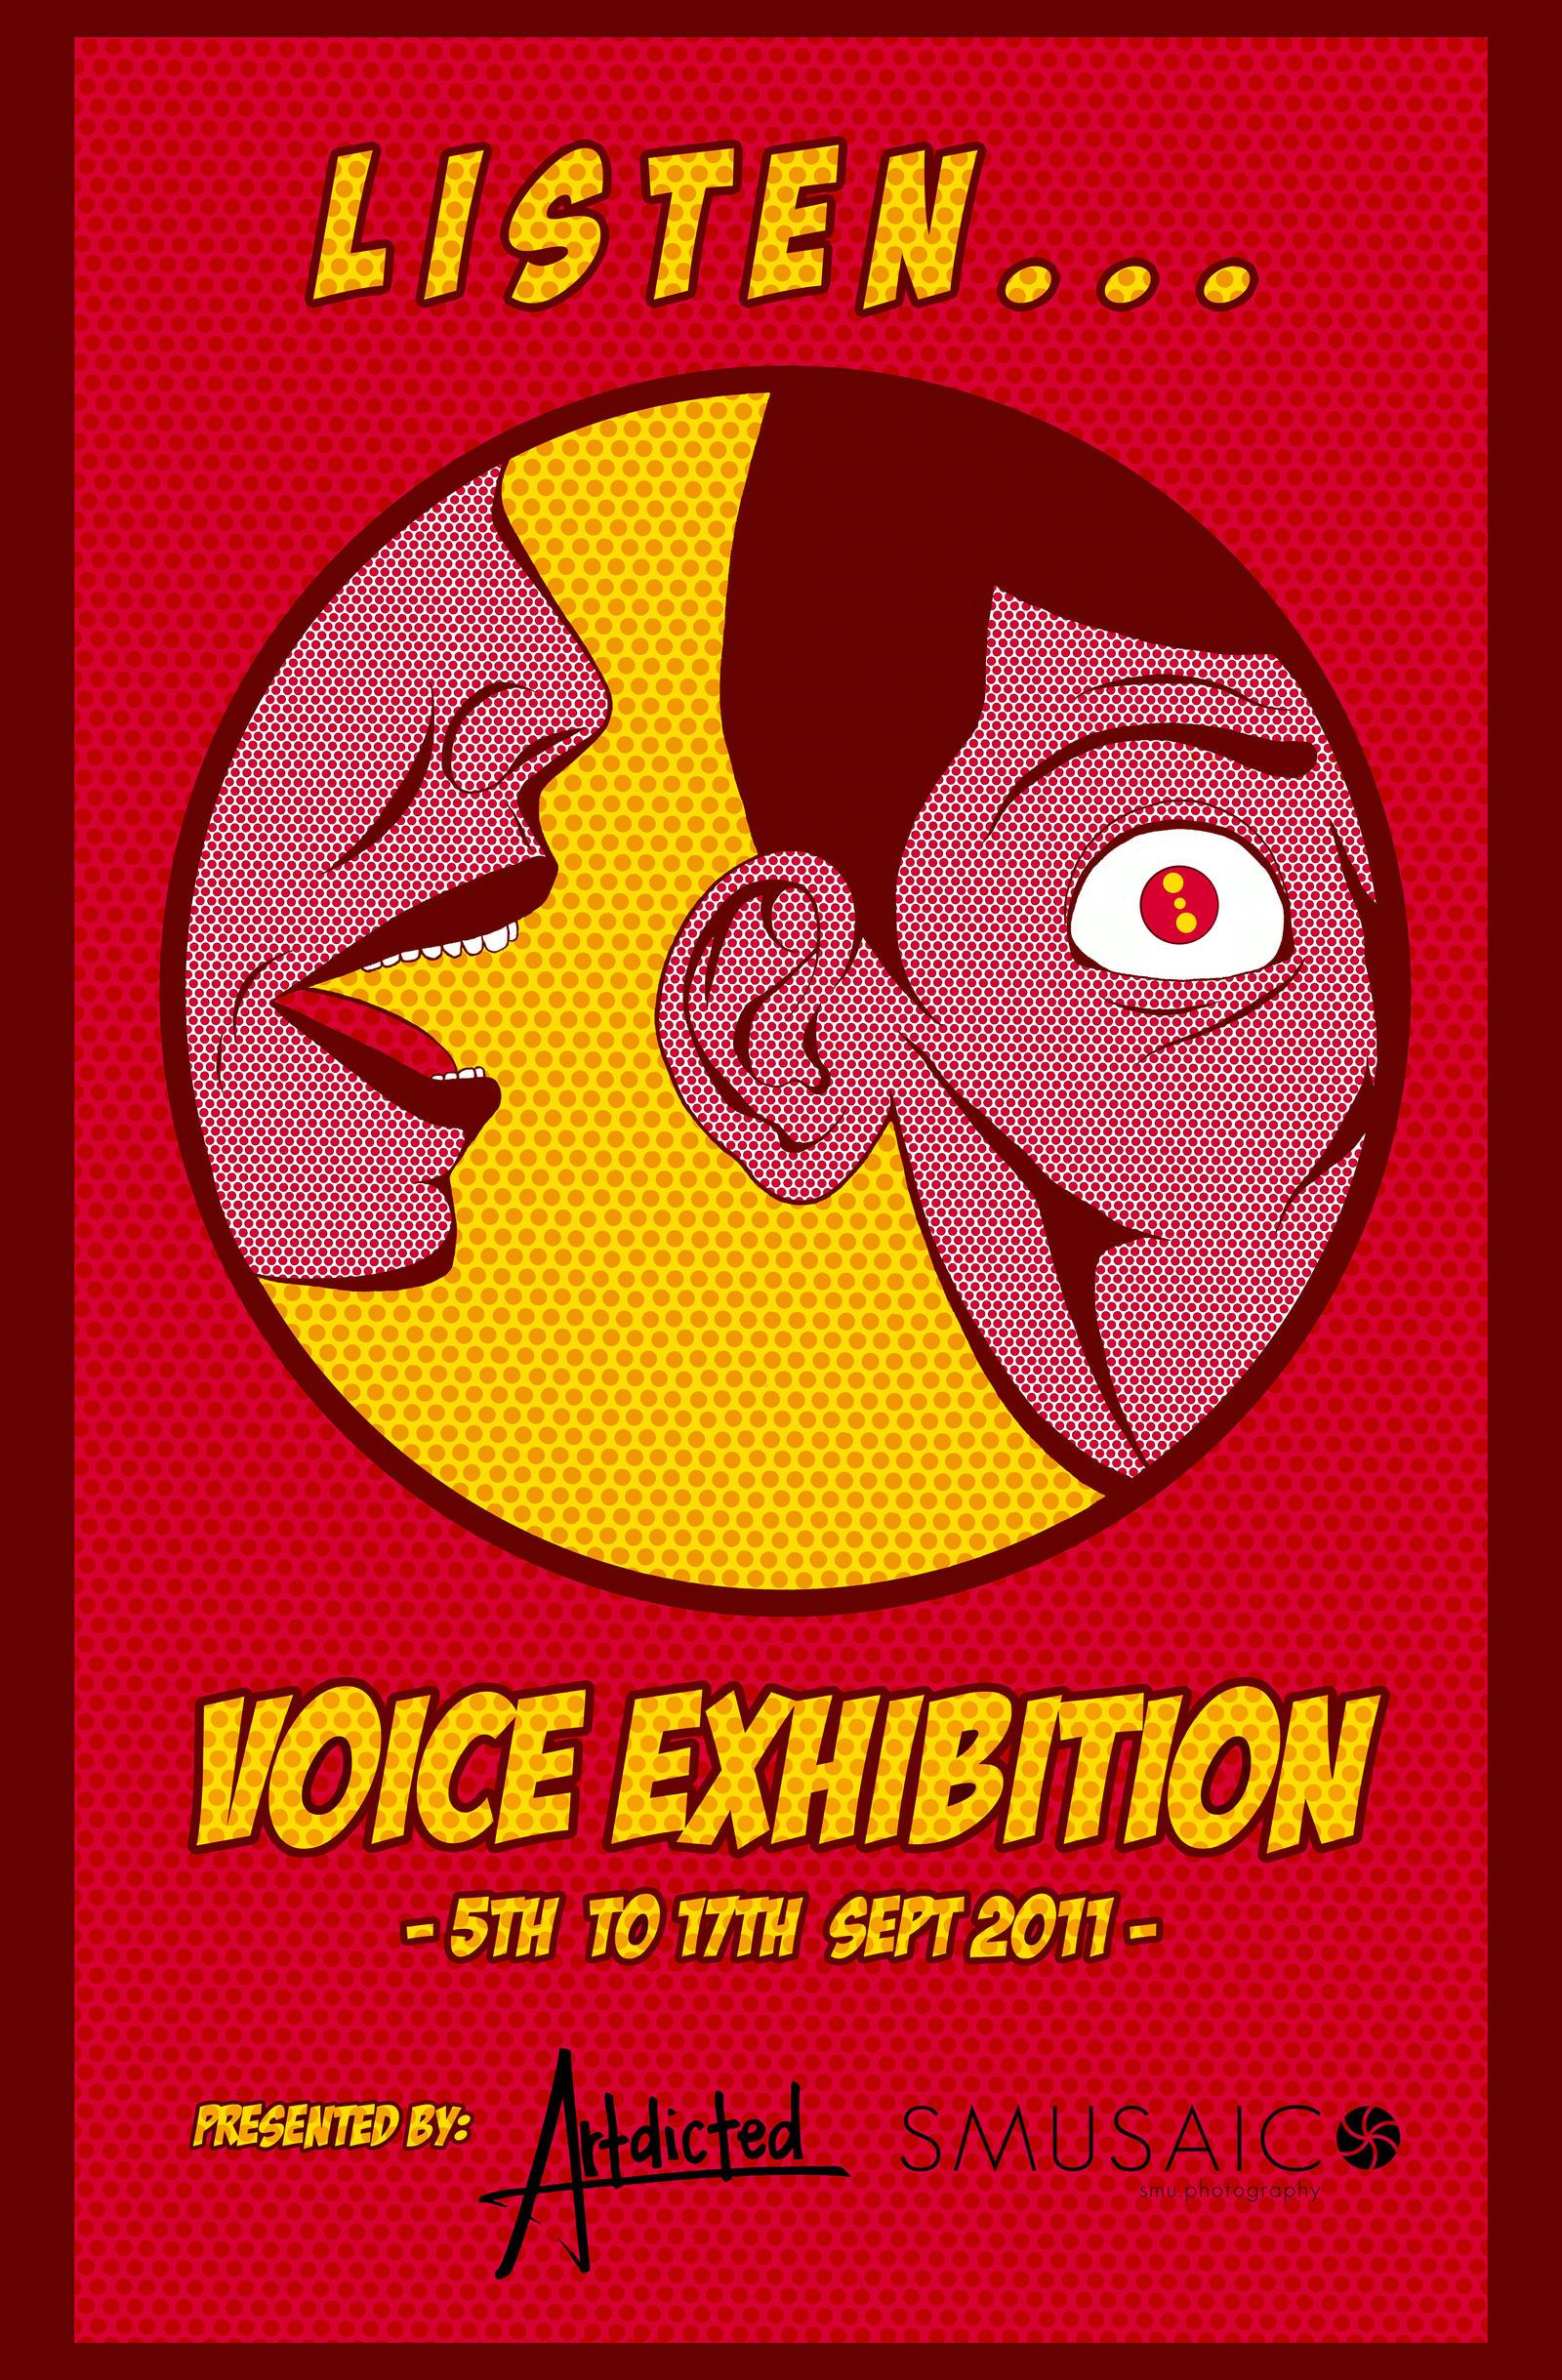 Listen - Exhibition Poster by desmondloo